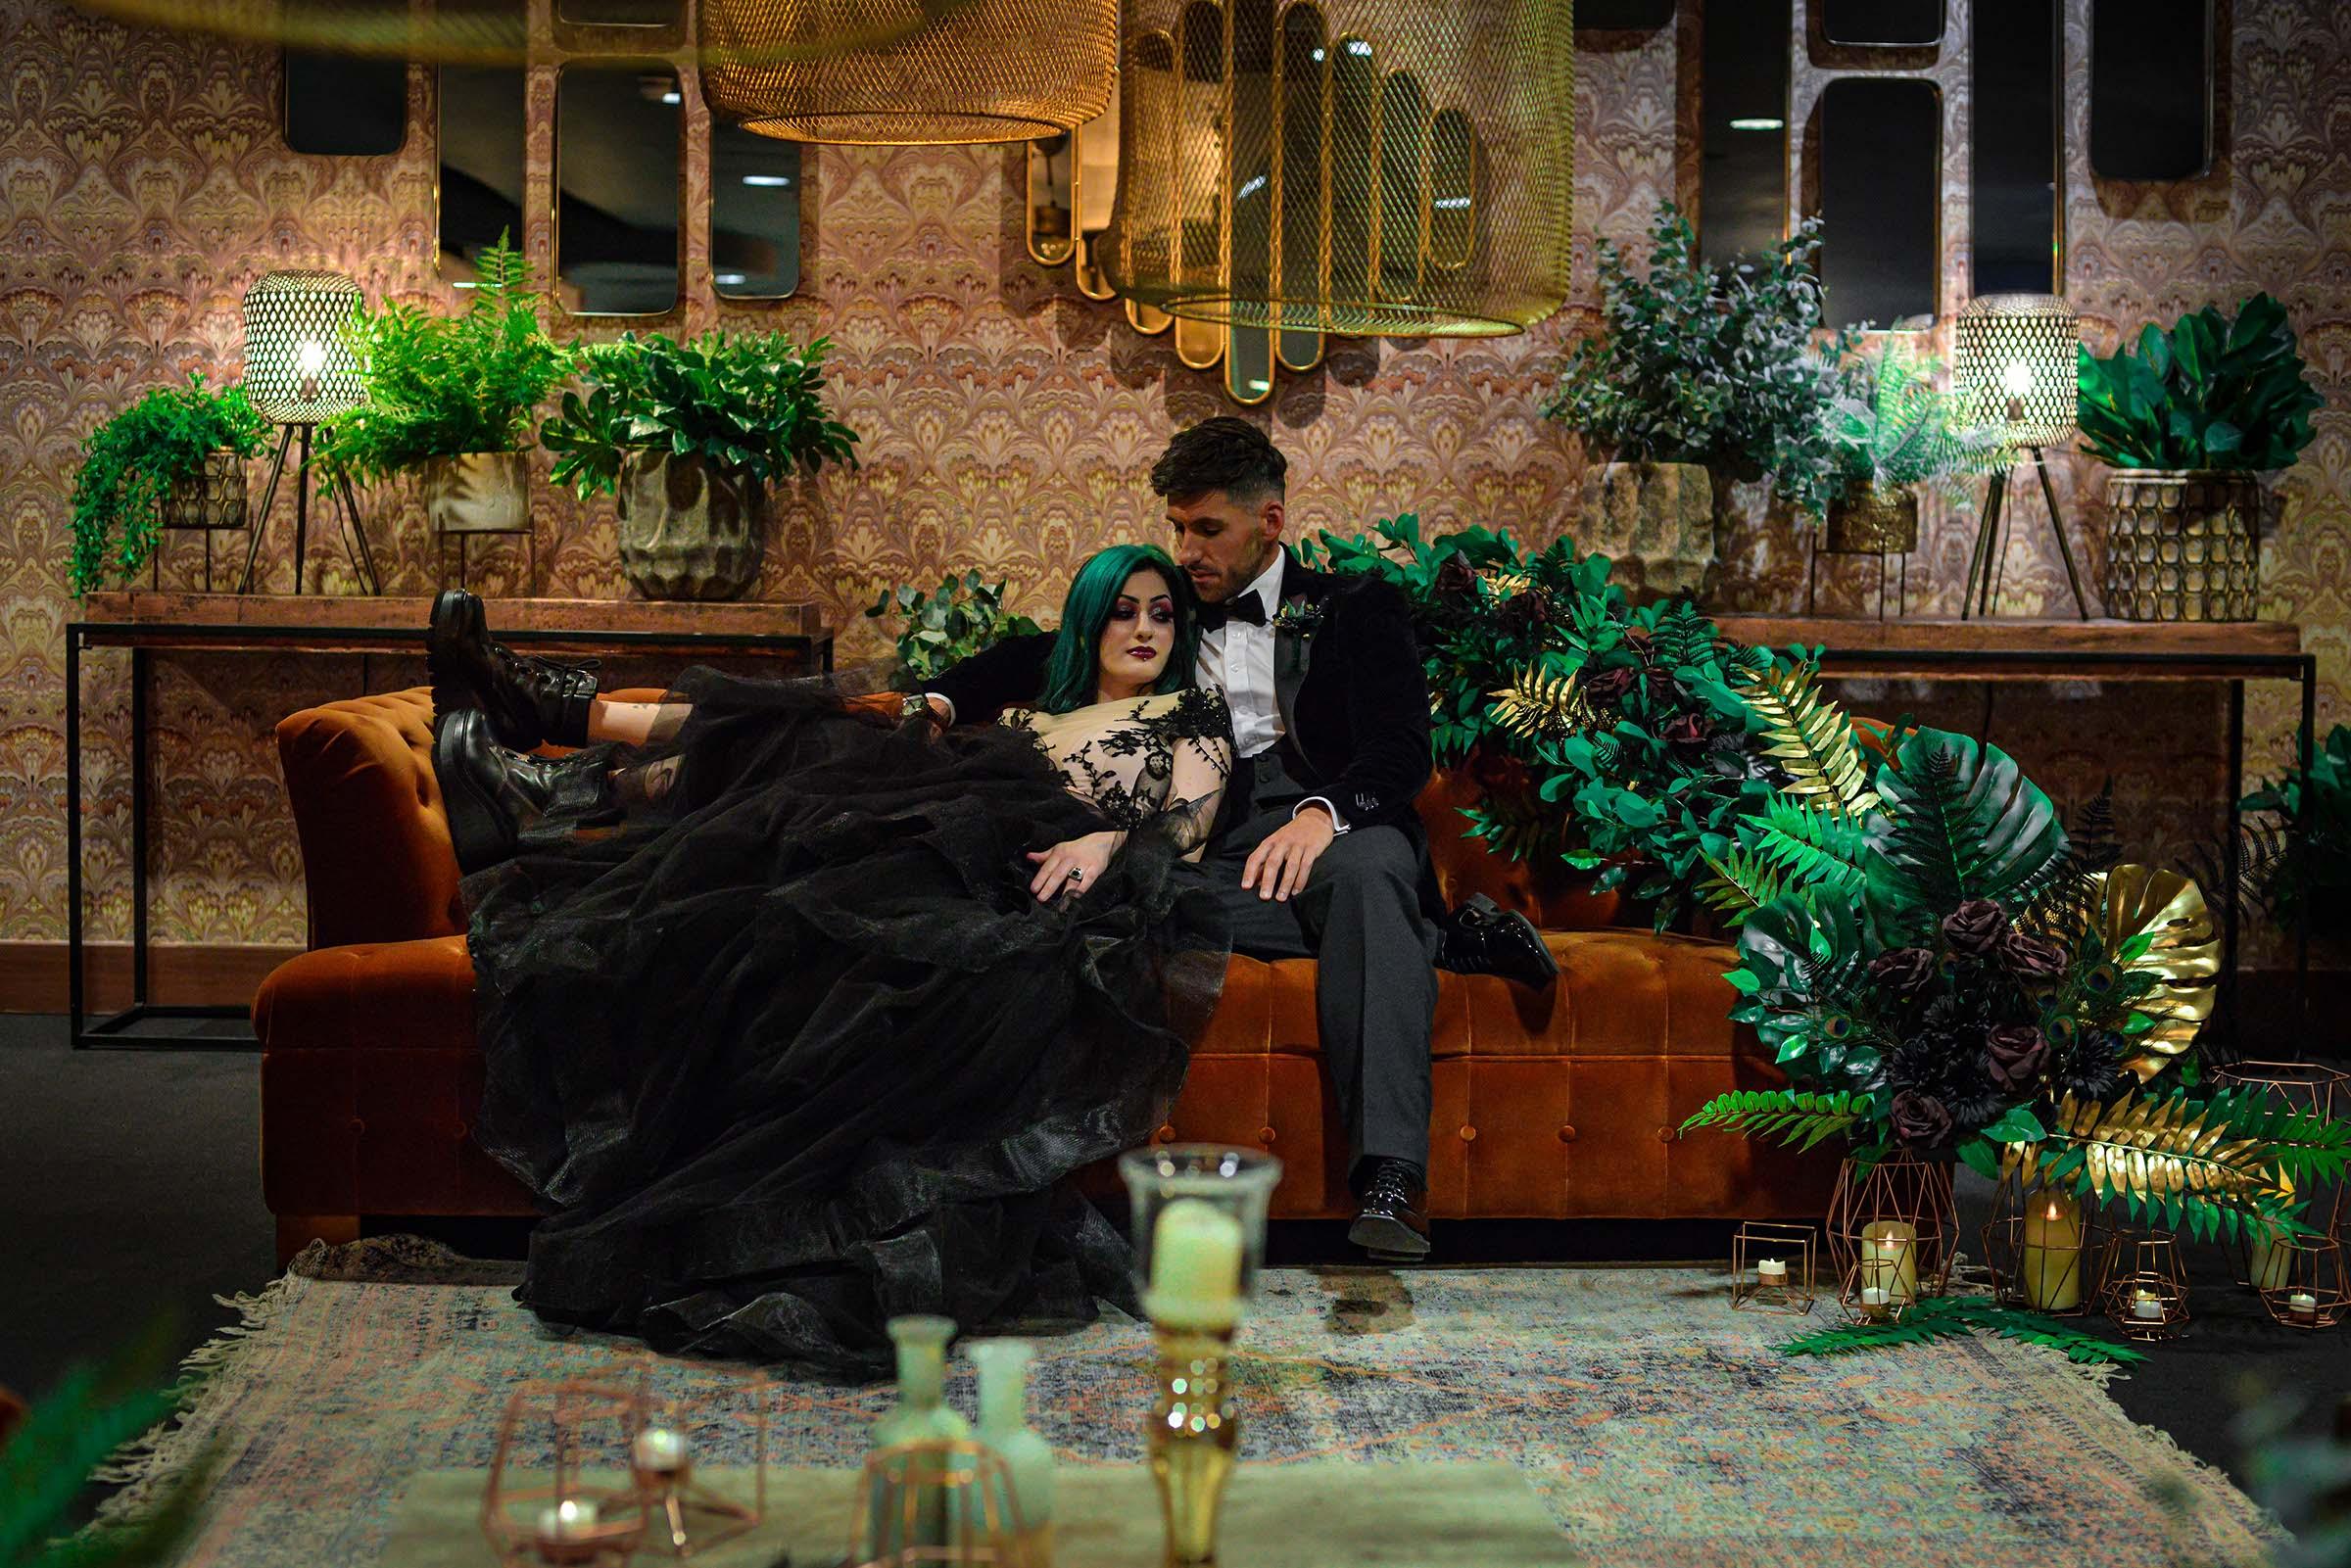 alternative luxe wedding - slytherin wedding - gothic wedding - alternative wedding - black wedding dress - wedding plants